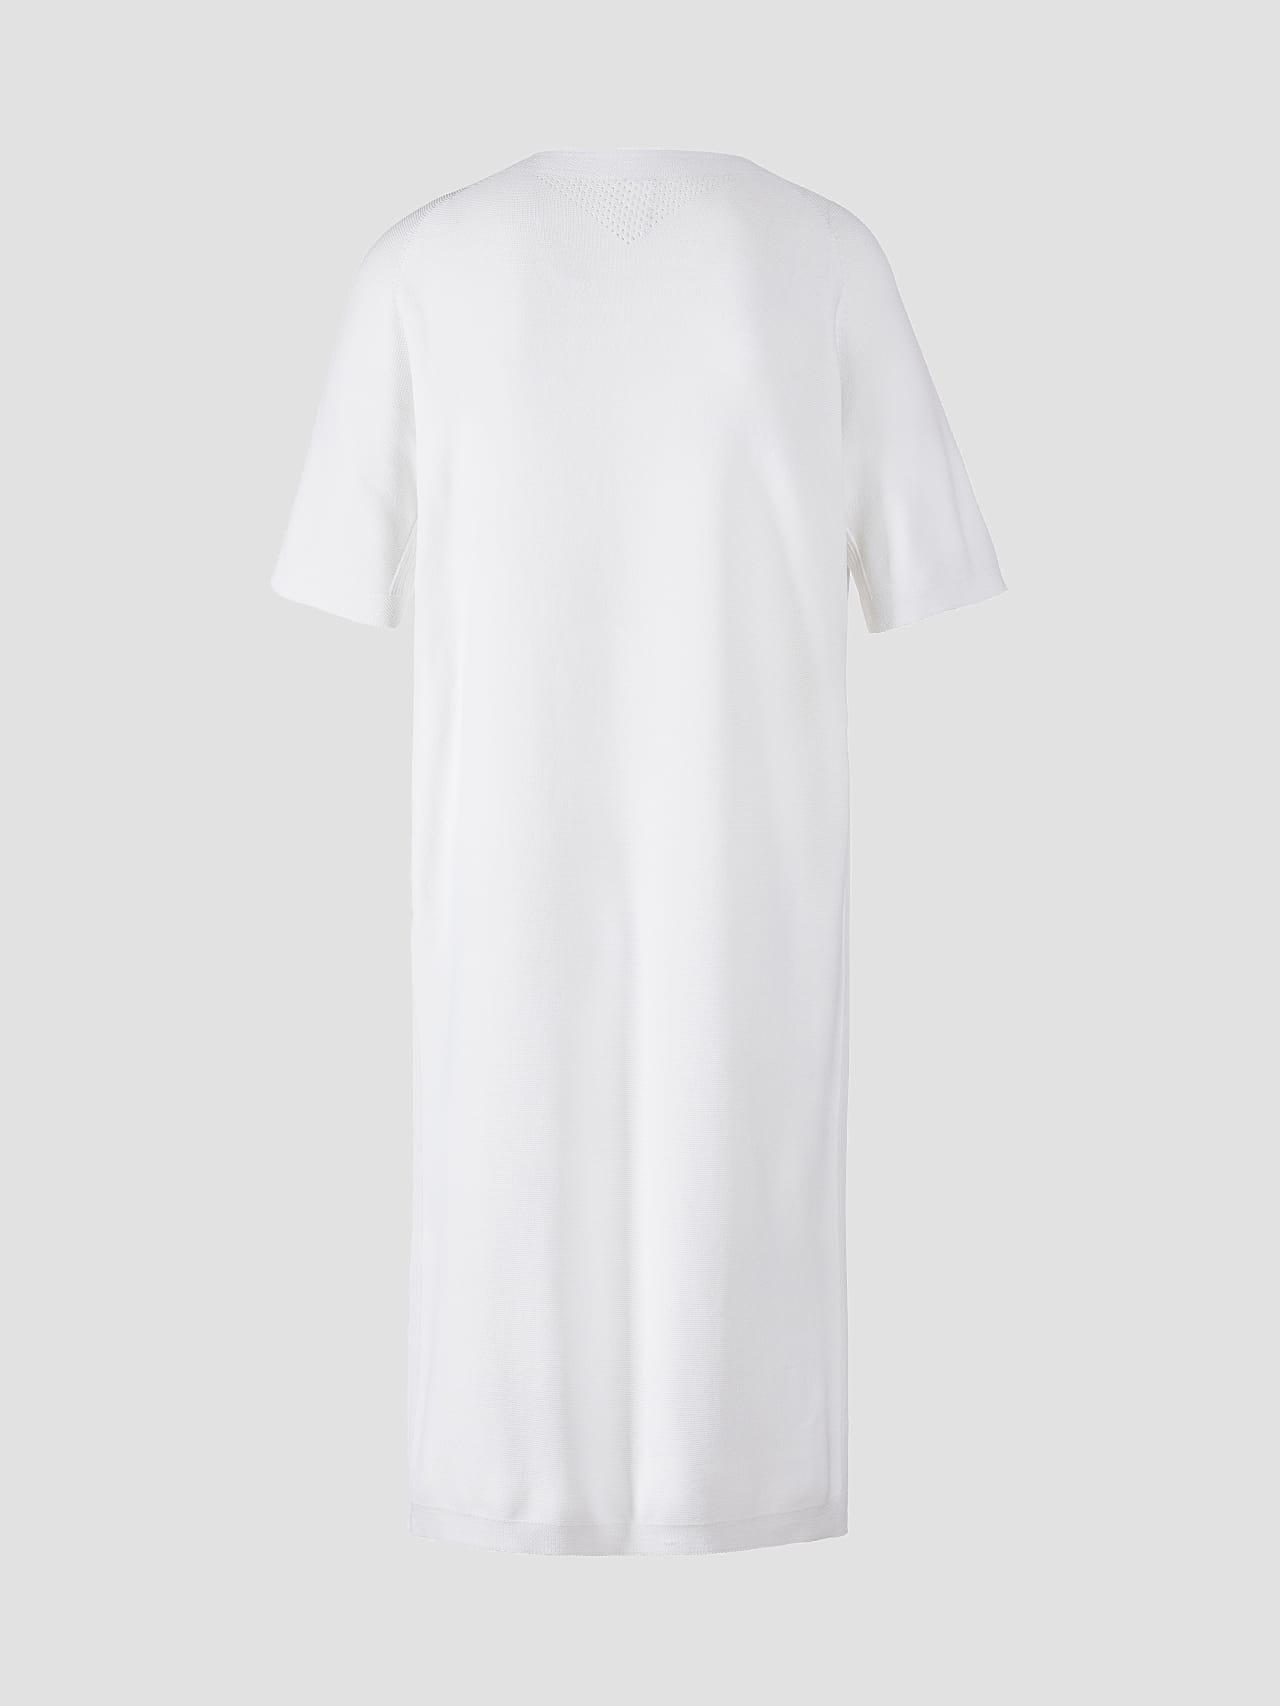 FZORF V1.Y5.01 Seamless Knit Dress white Left Alpha Tauri